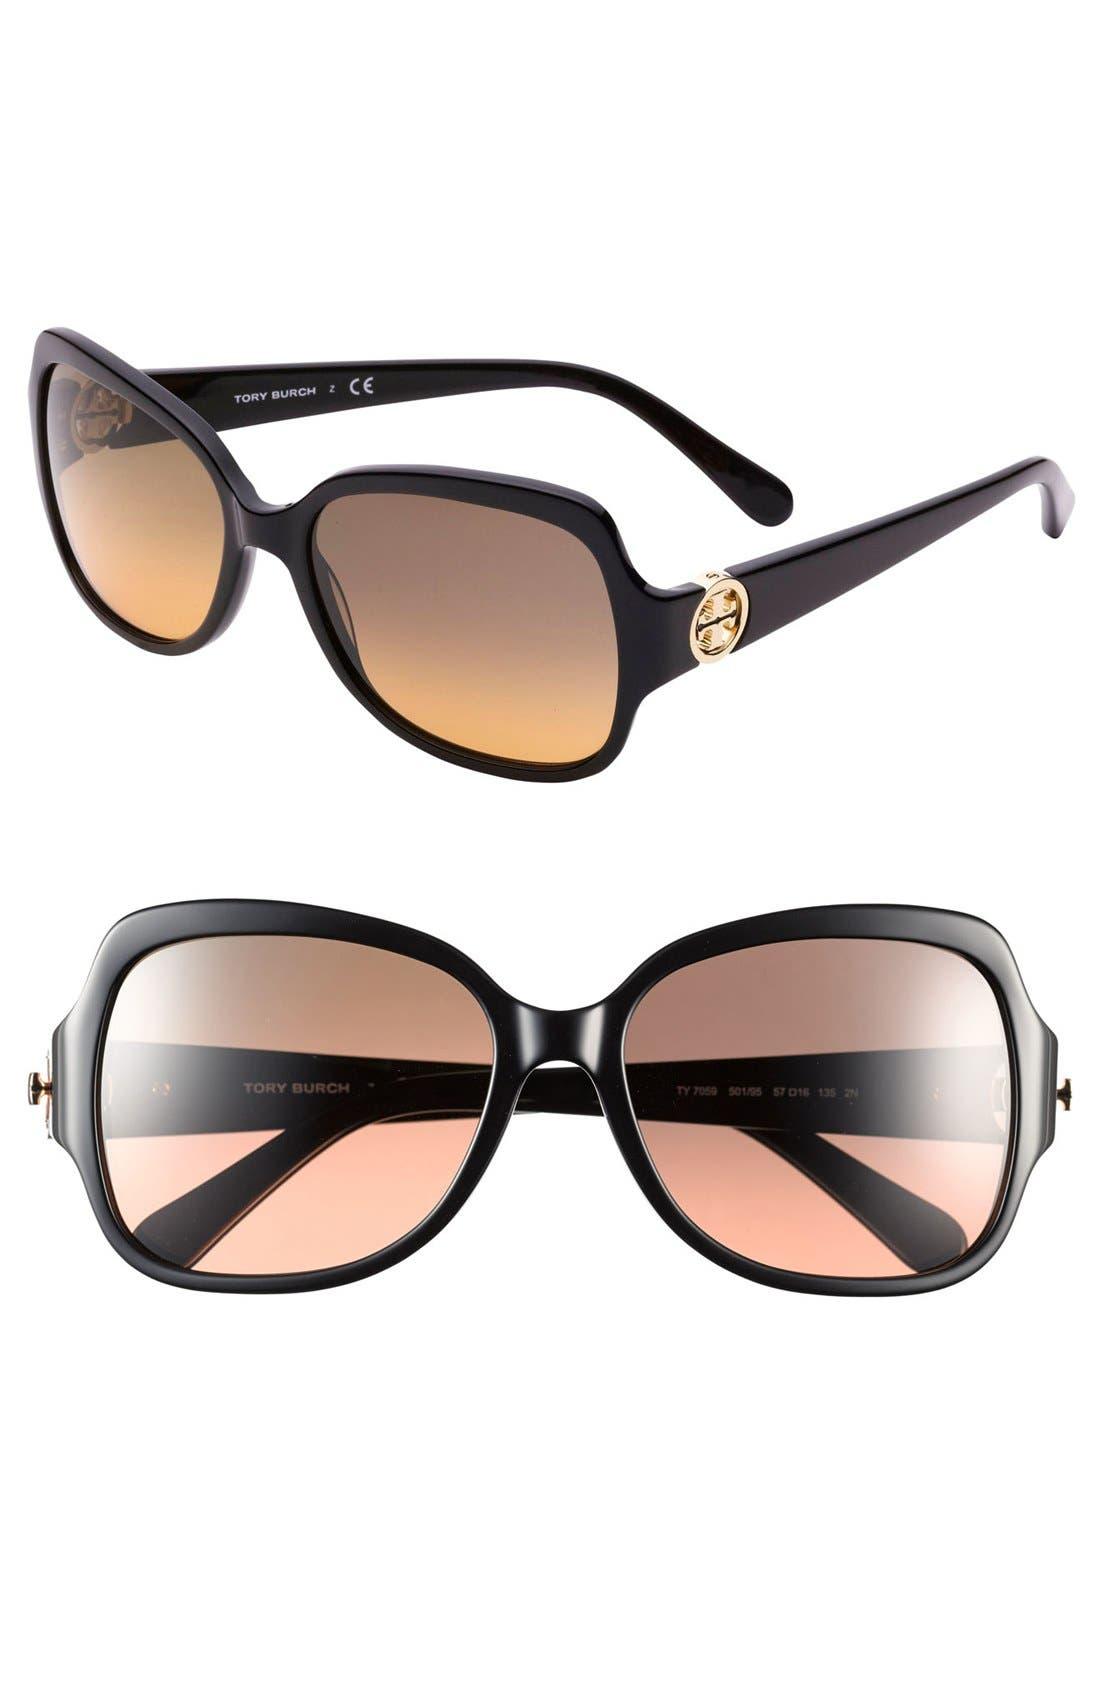 Main Image - Tory Burch 'Glam' 57mm Logo Hinge Sunglasses